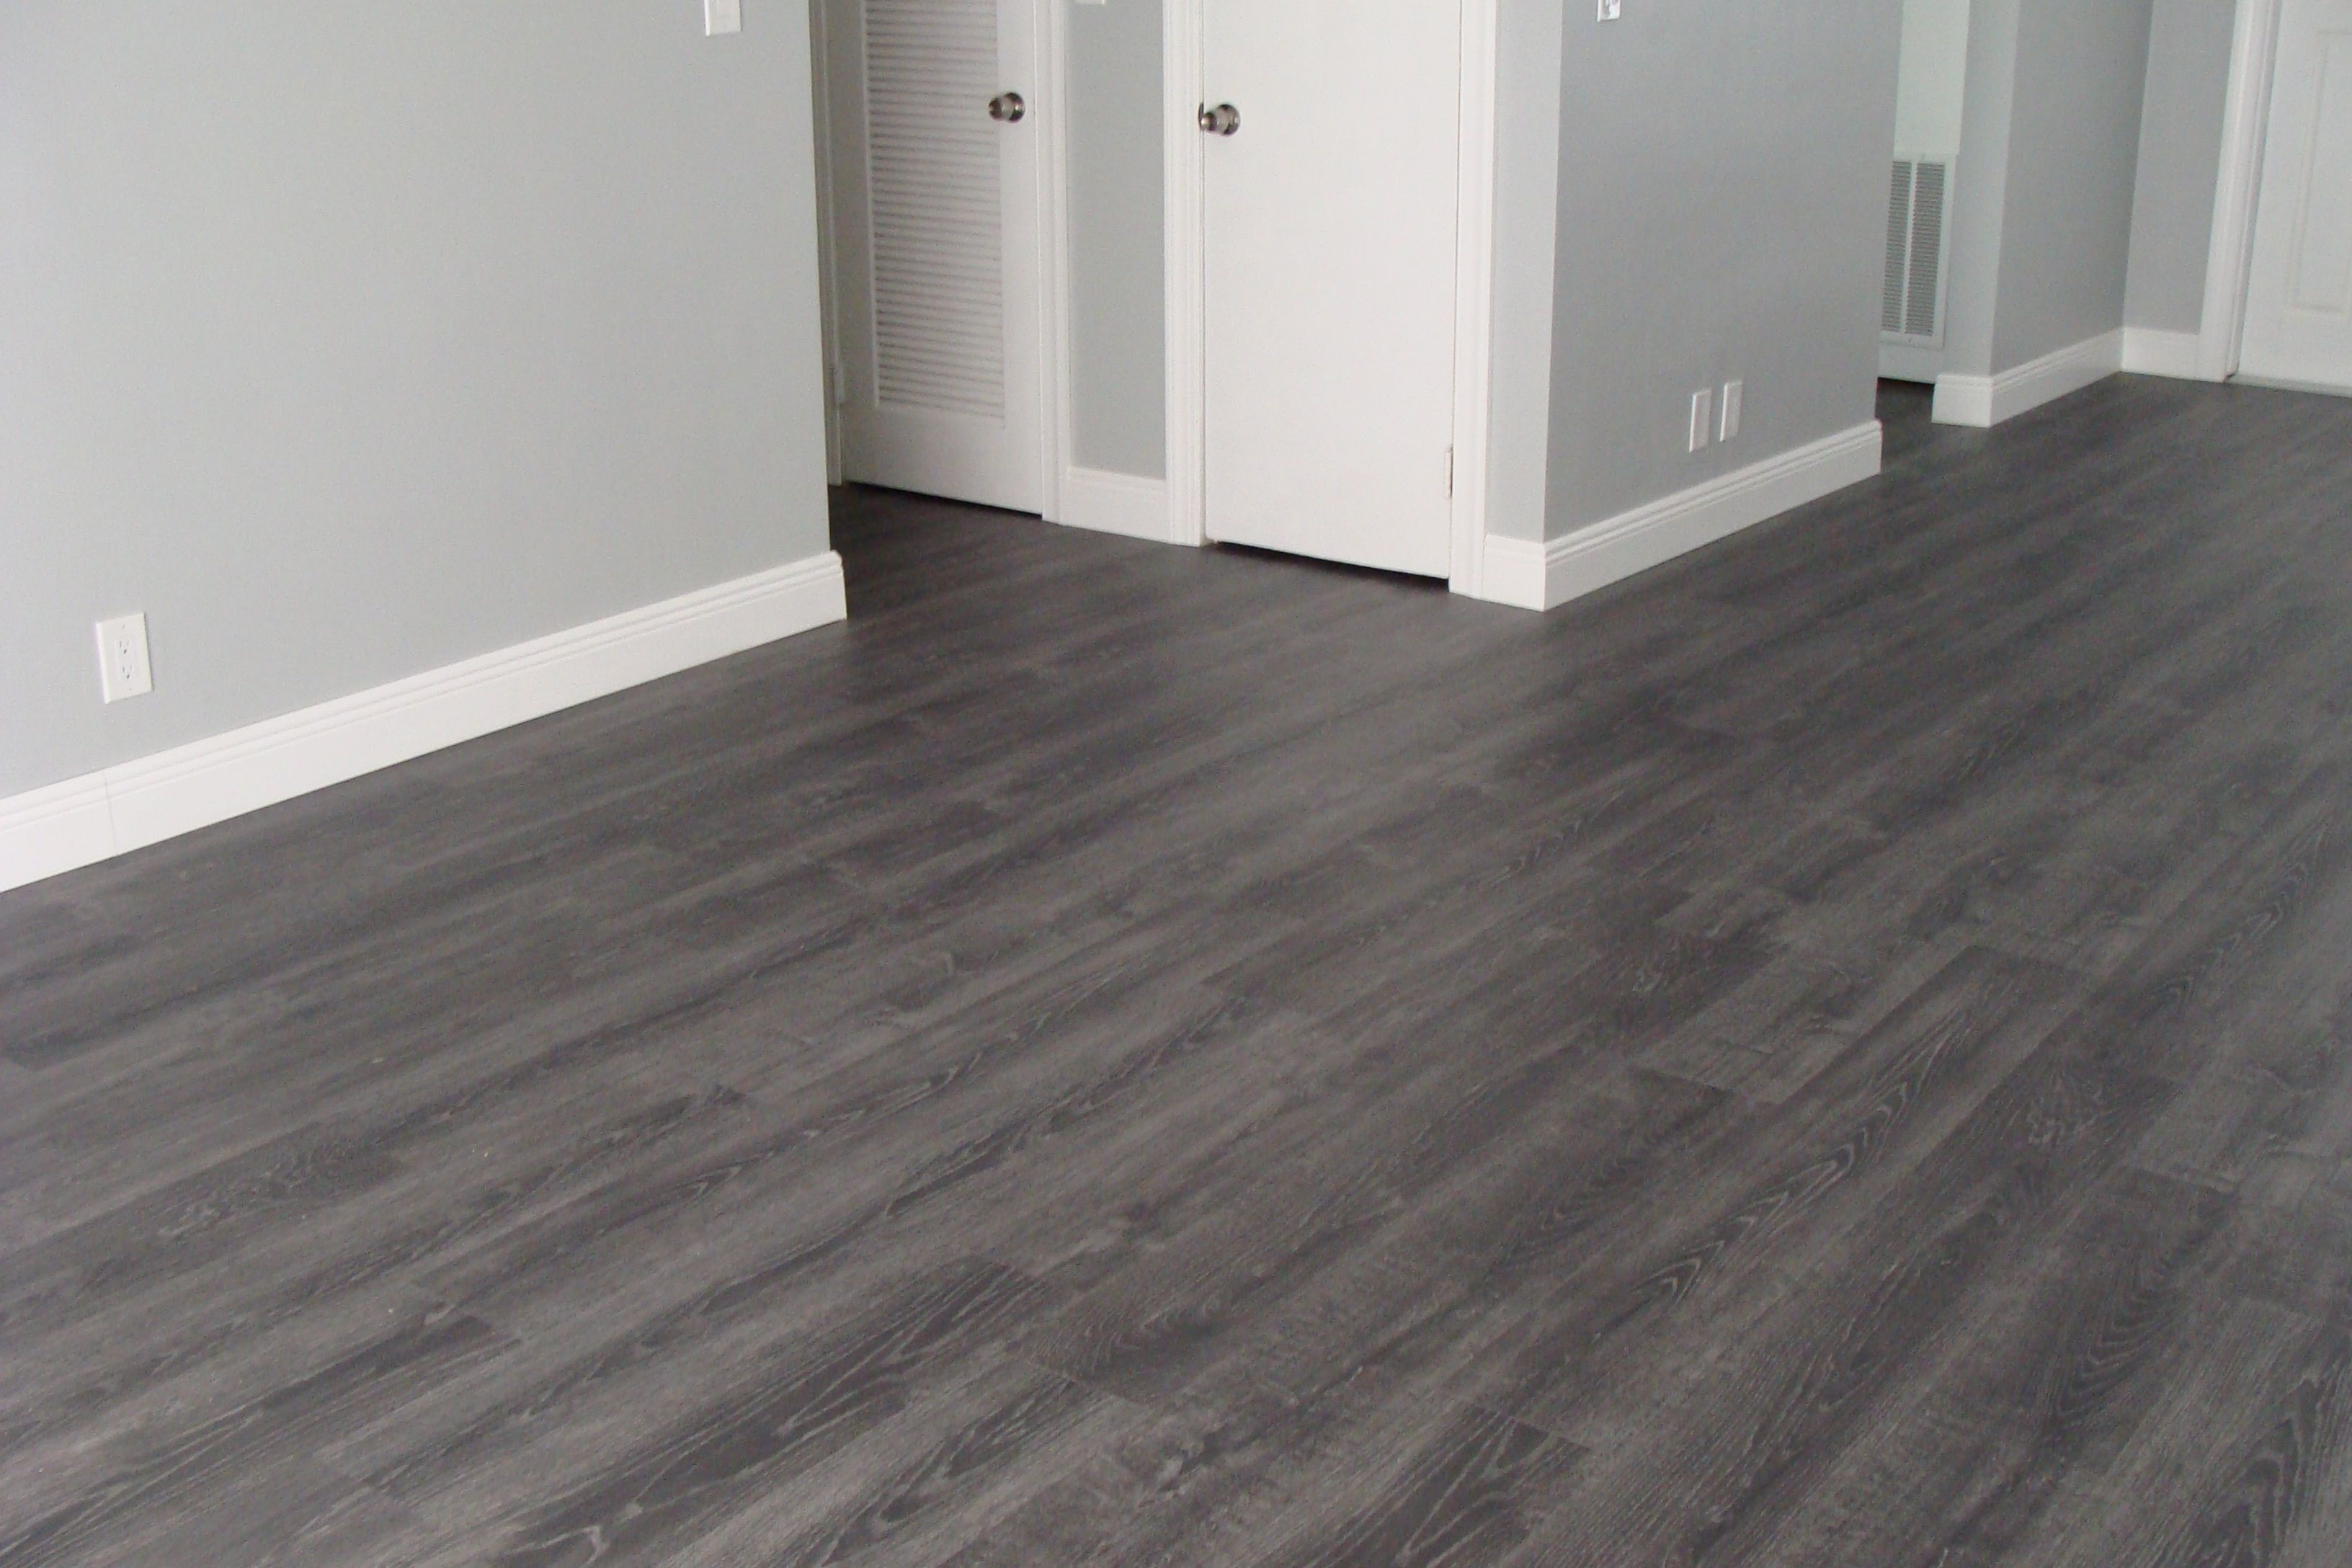 Grey Laminate Wood Flooring In 2020 Grey Laminate Flooring Grey